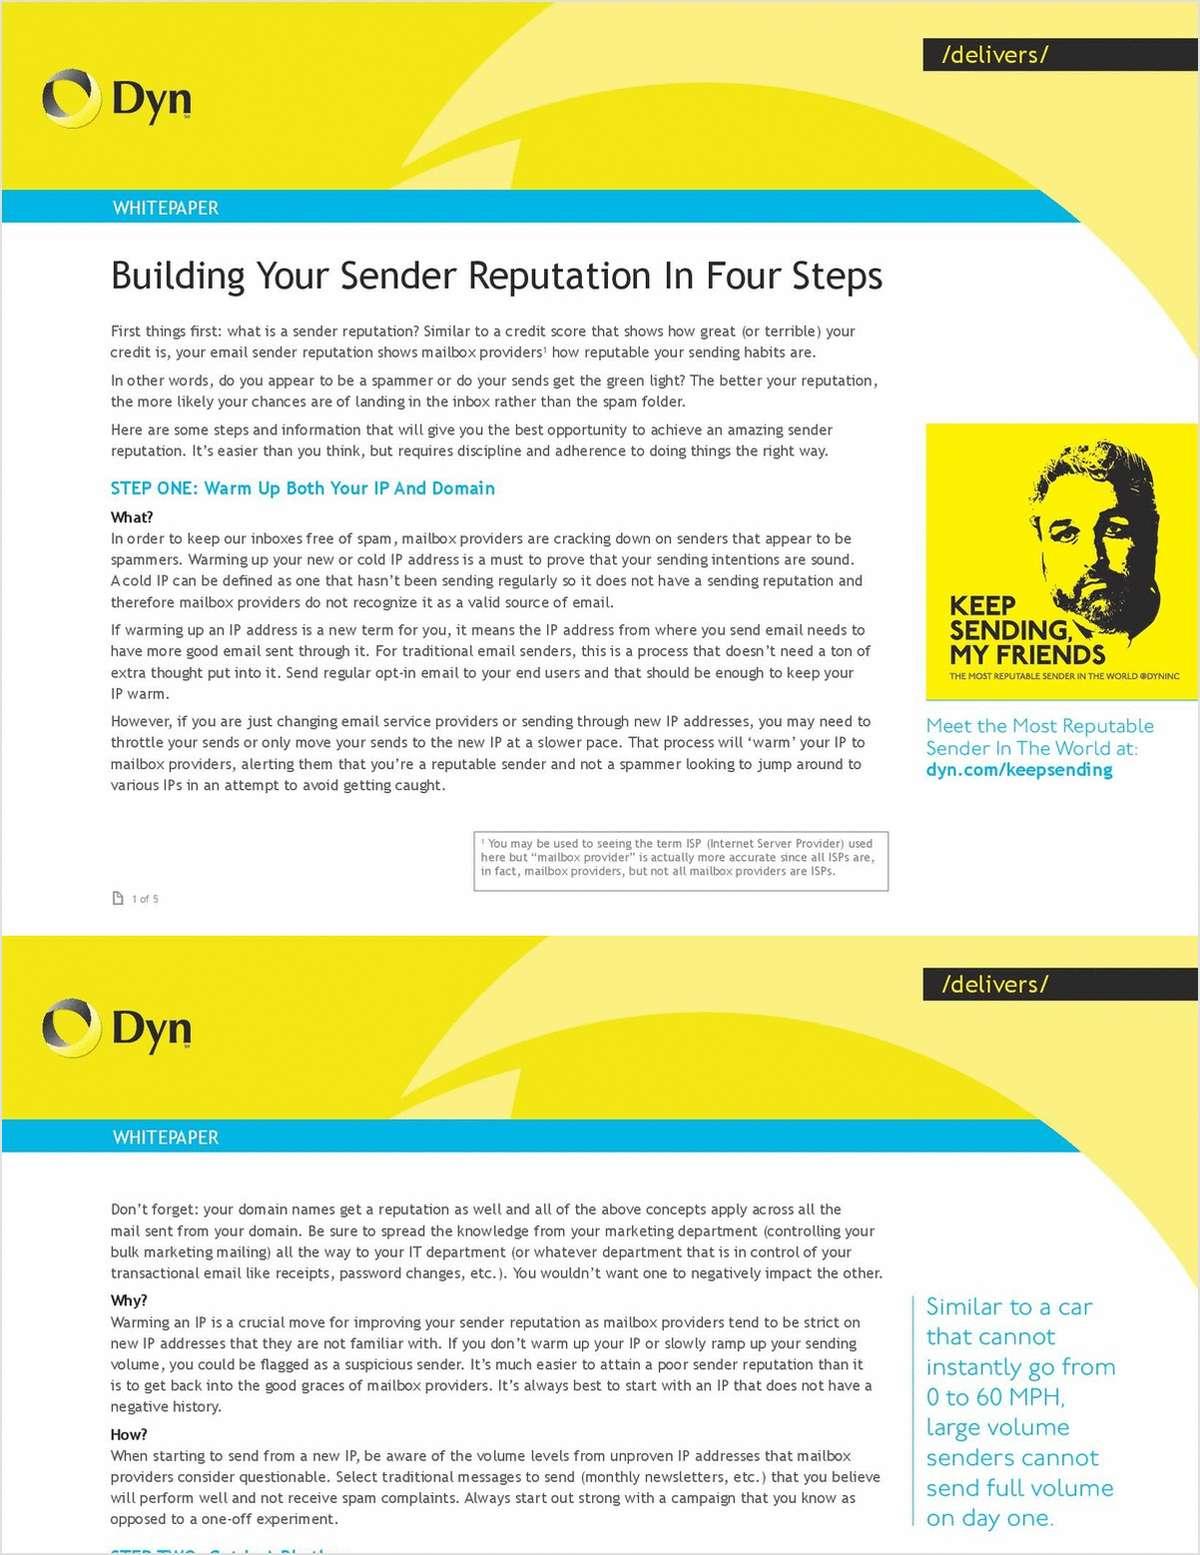 Four Steps To Build your Sender Reputation